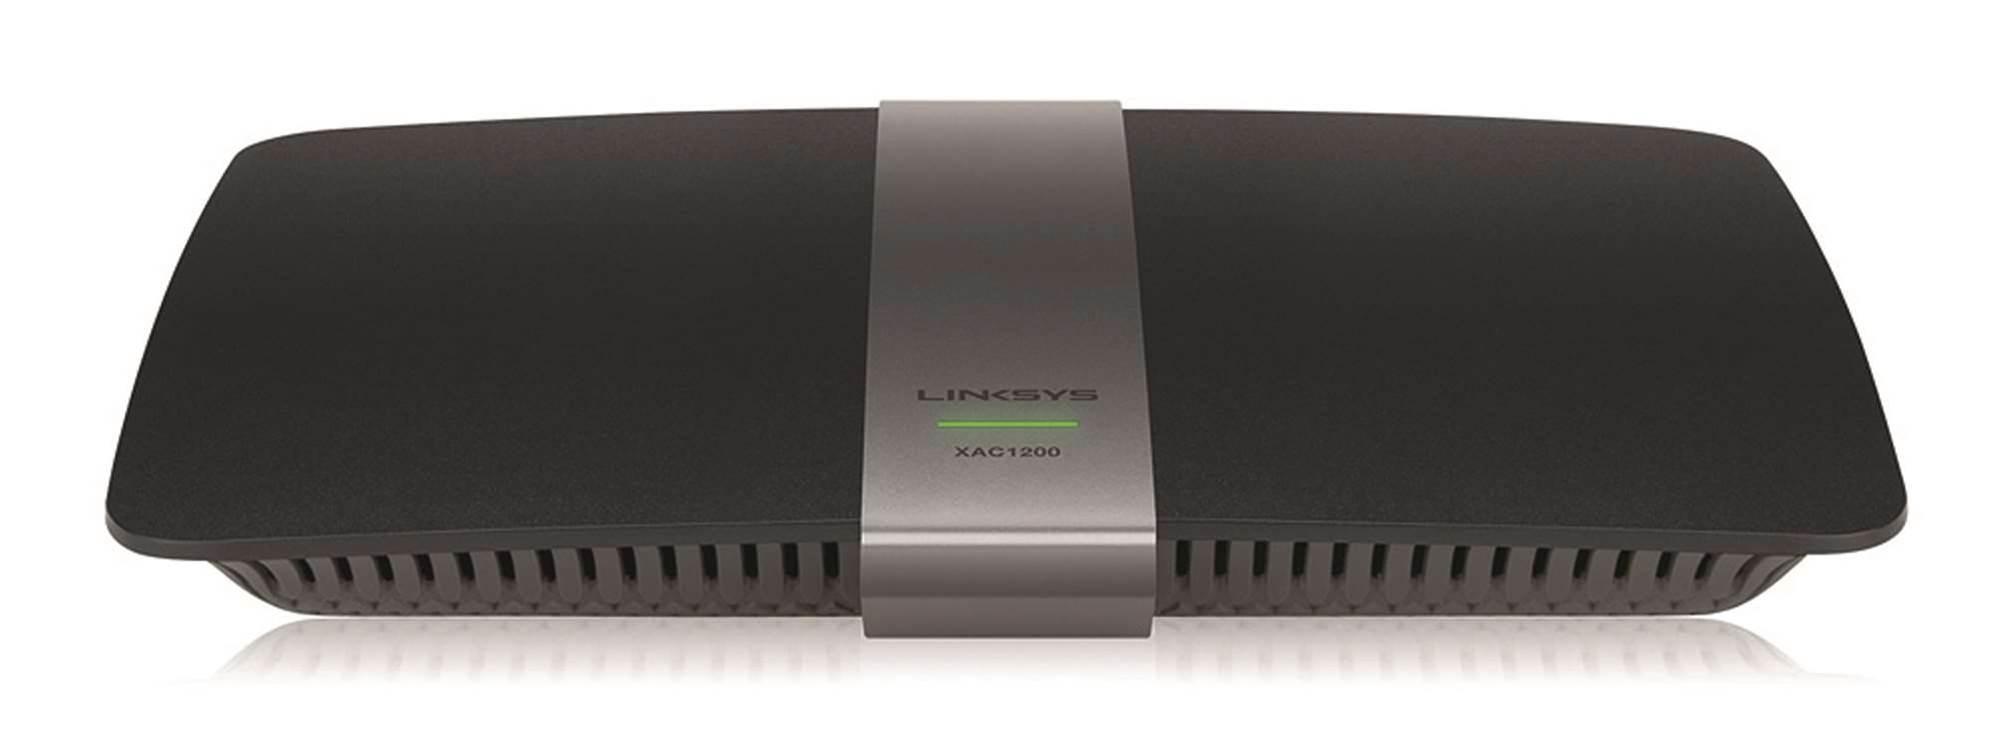 Review: Linksys XAC1200